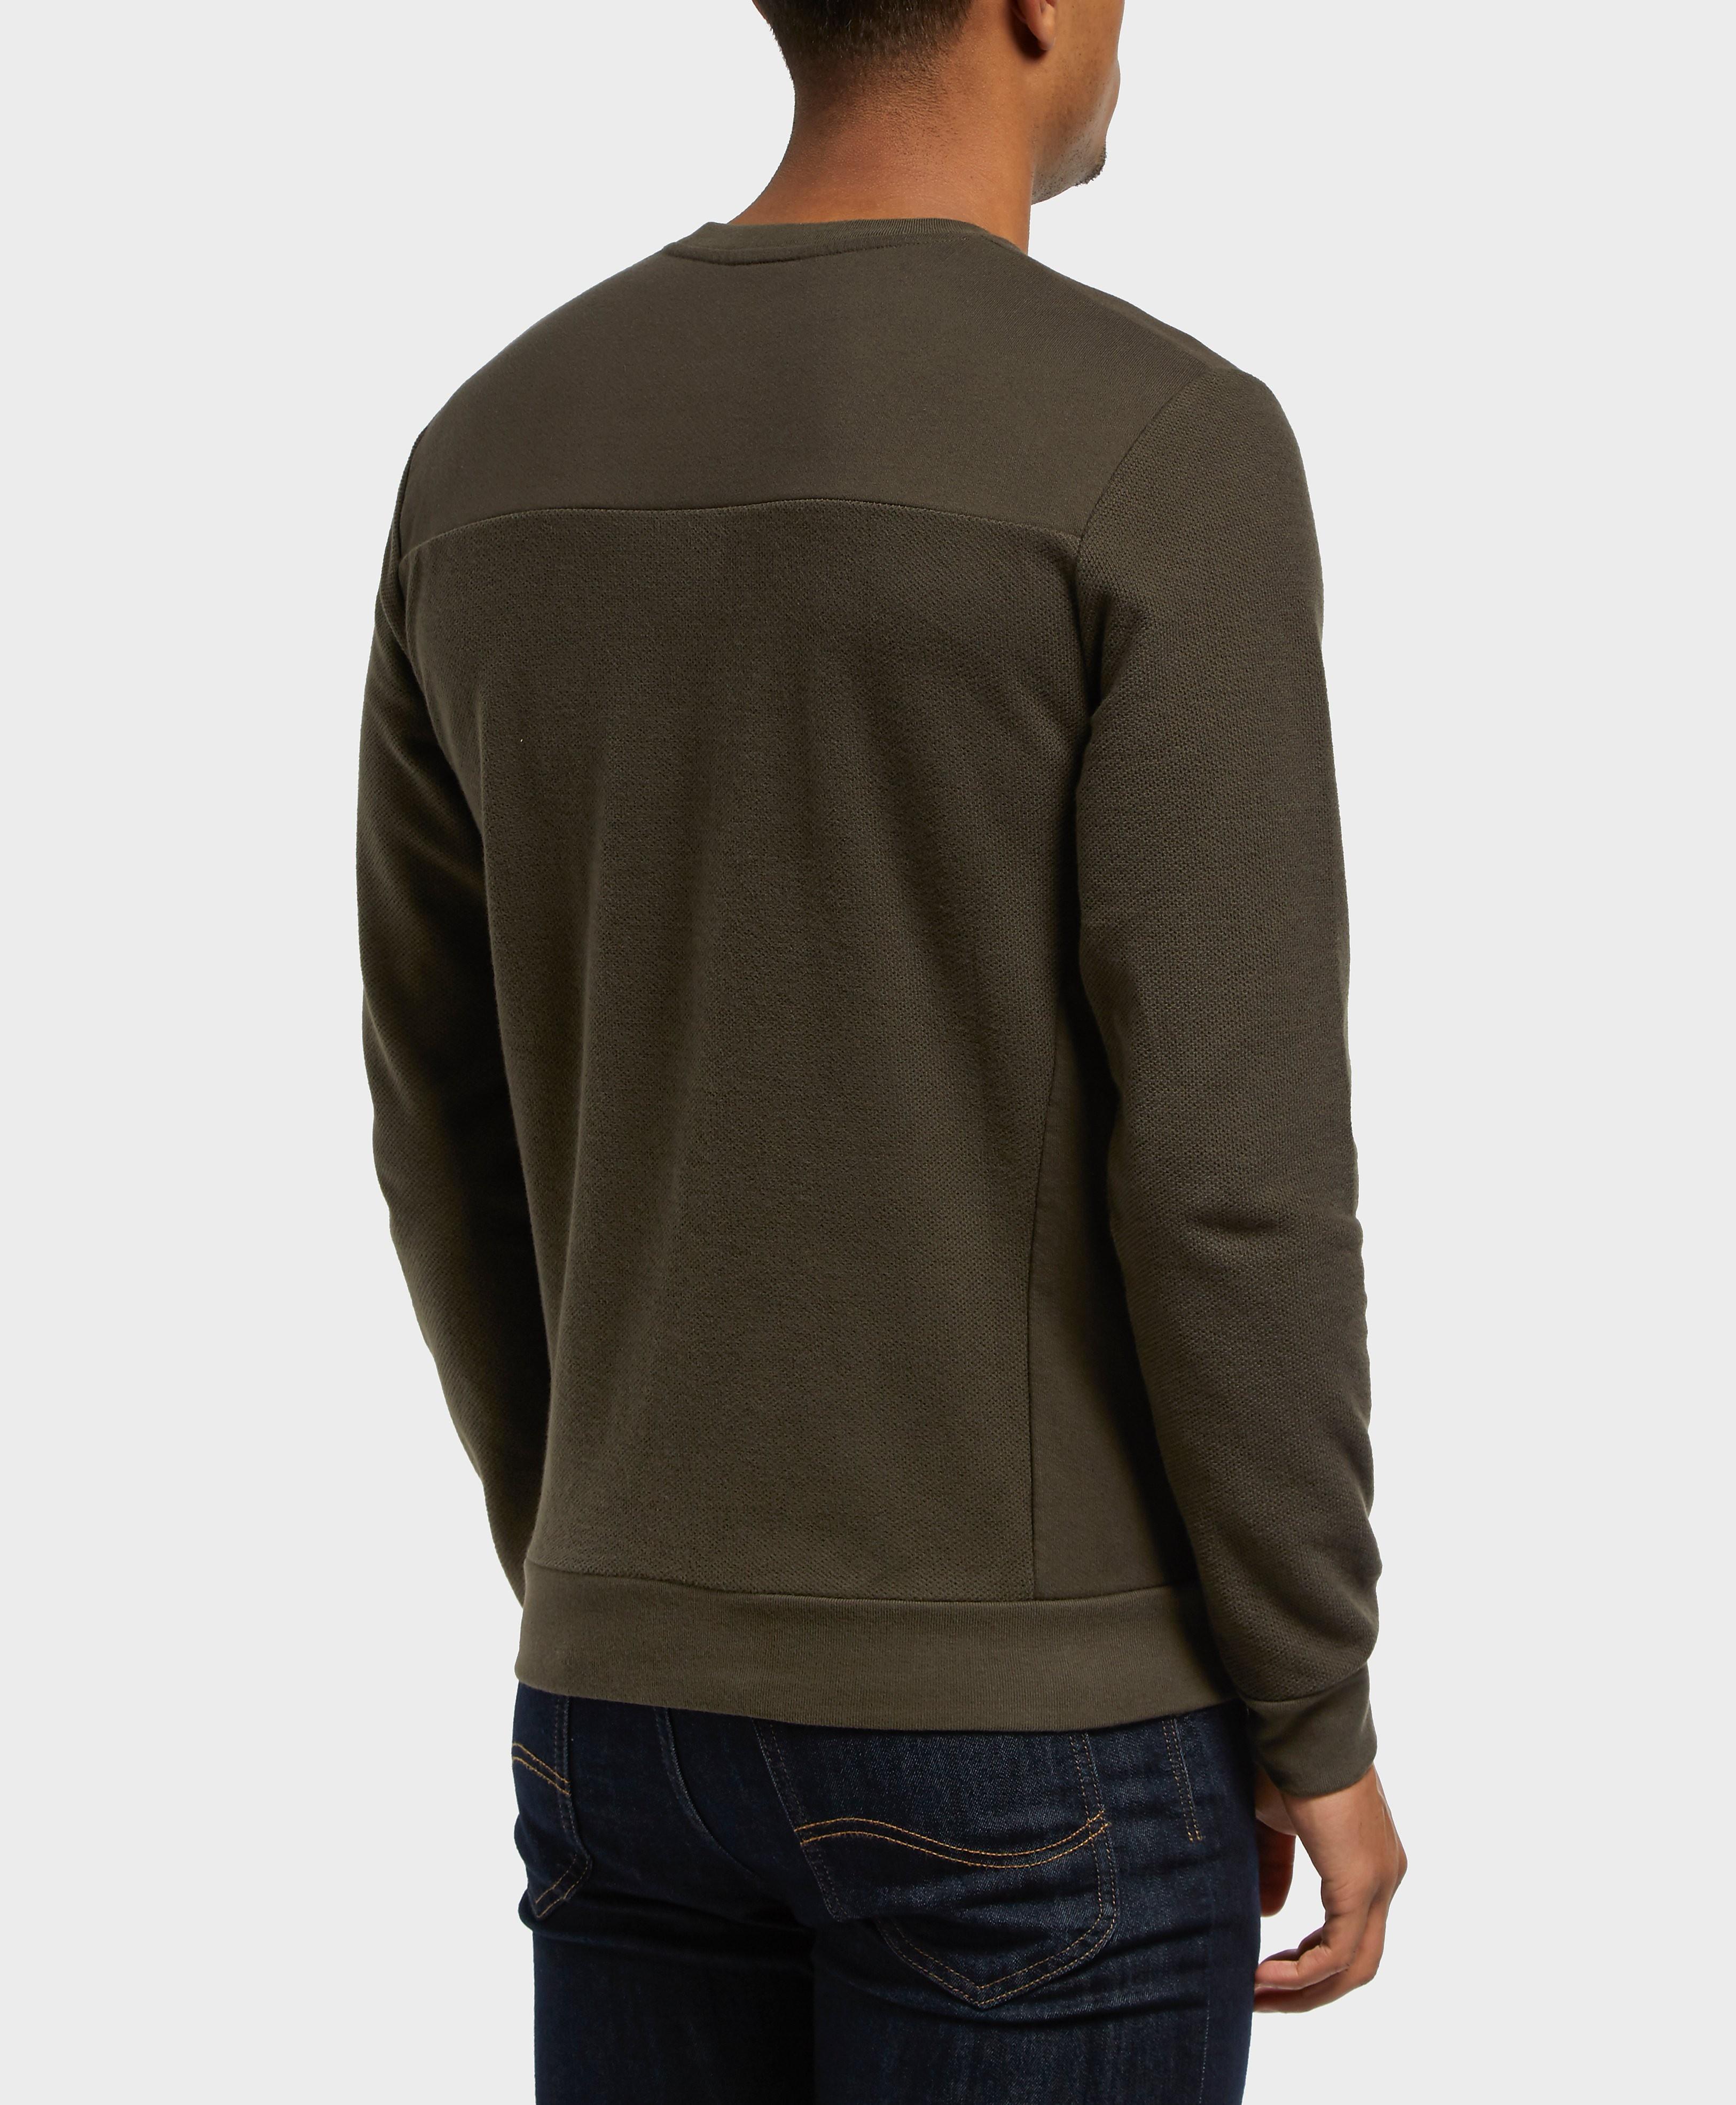 Pyrenex Hanko Crew Neck Sweatshirt